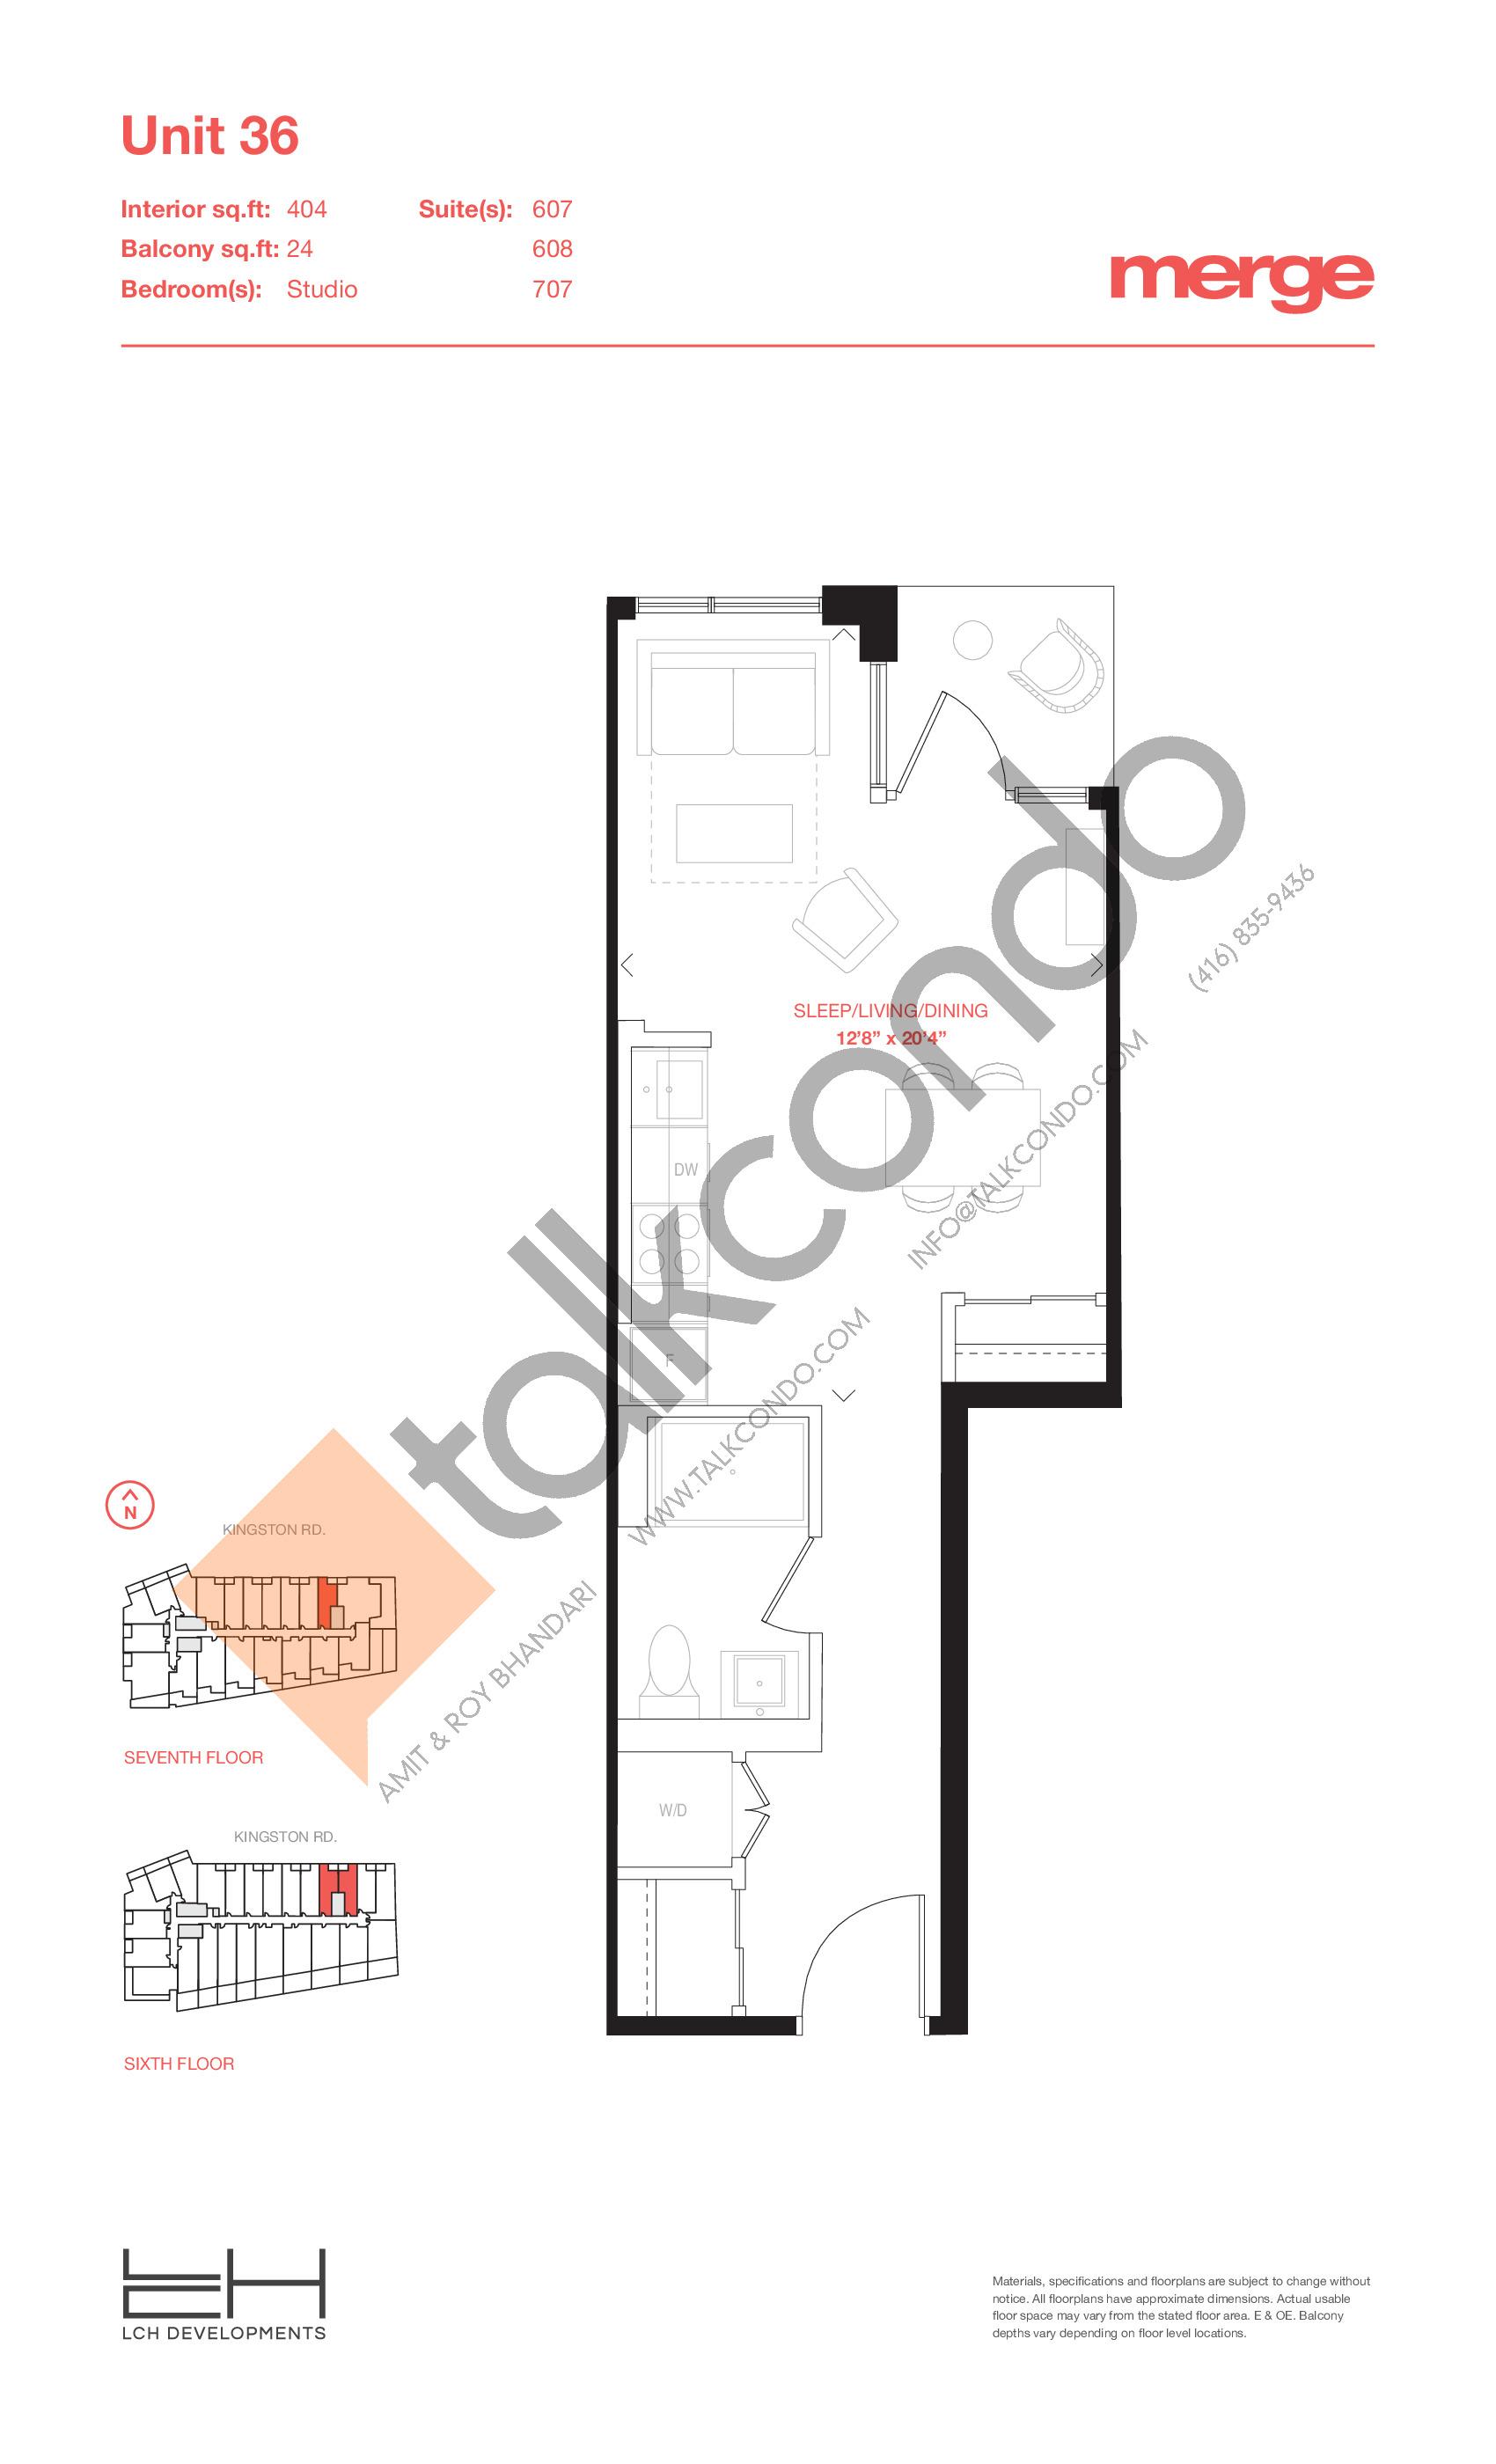 Unit 36 - Tower Floor Plan at Merge Condos - 404 sq.ft